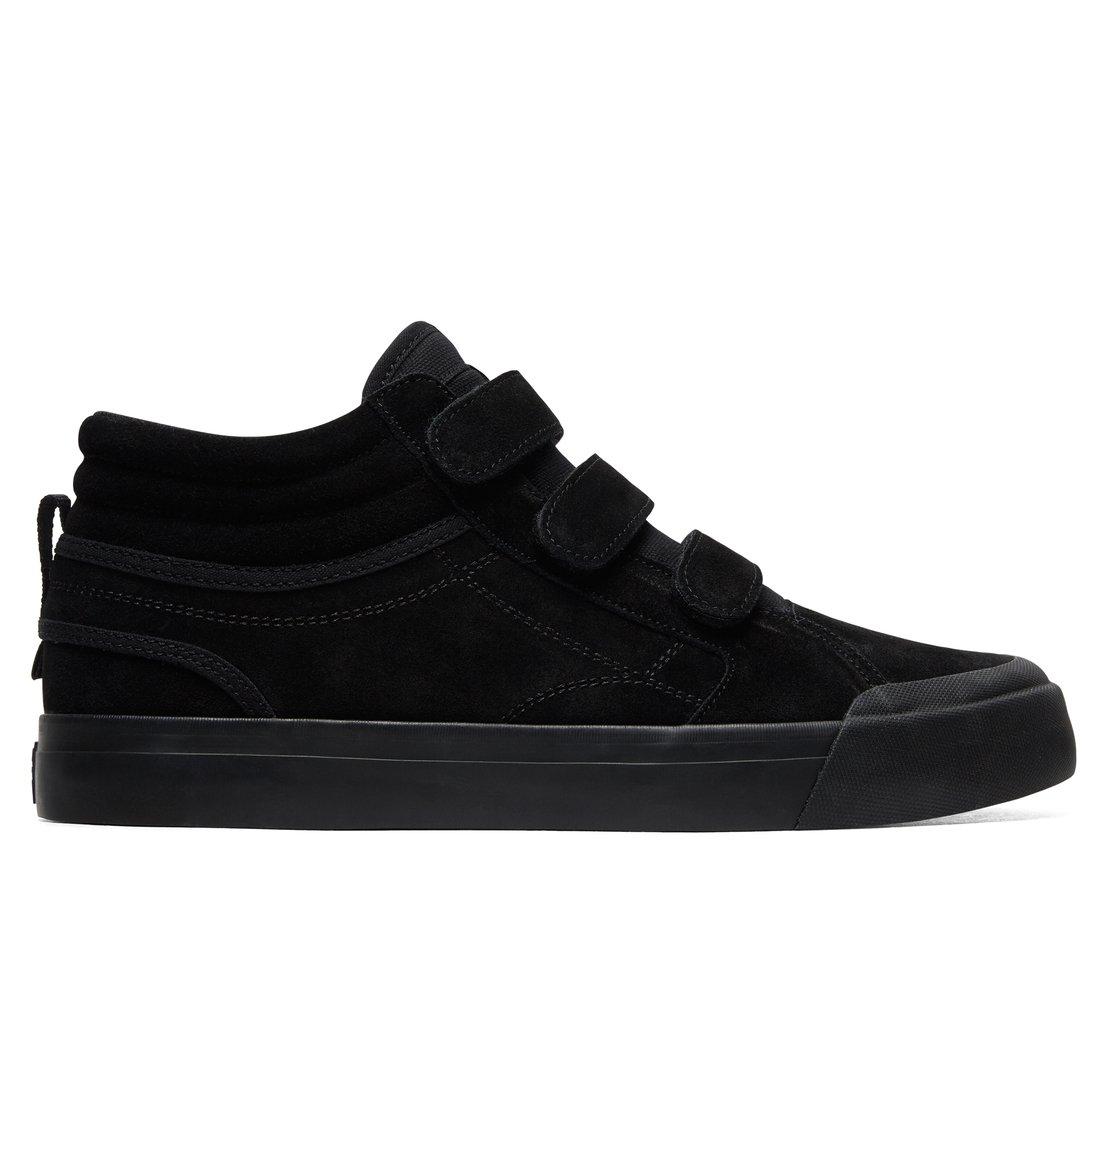 317a1764ab 0 Evan Smith Hi V S High-Top Skate Shoes Black ADYS300523 DC Shoes